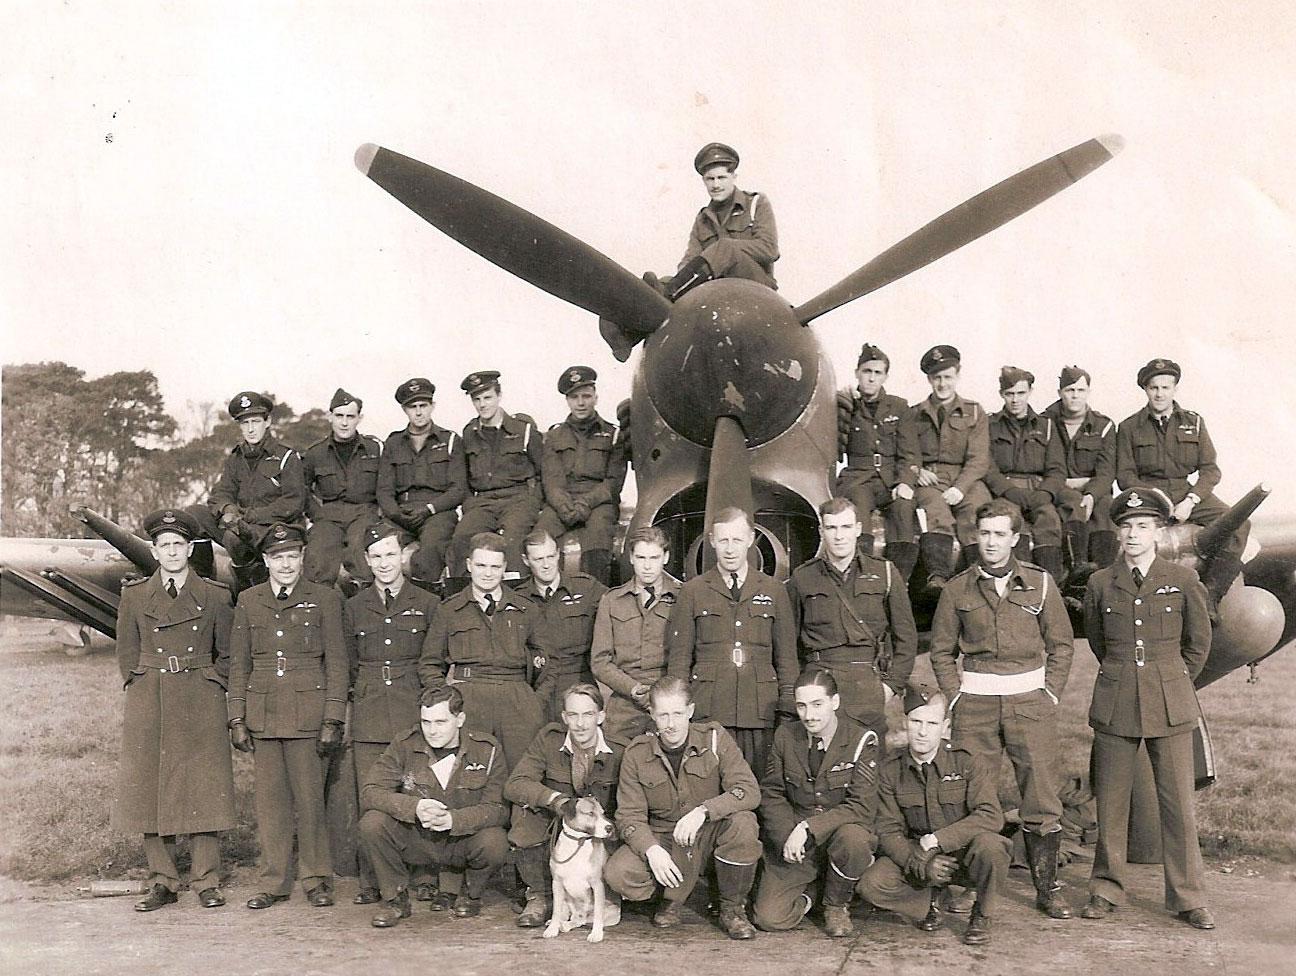 No. 174 Squadron RAF